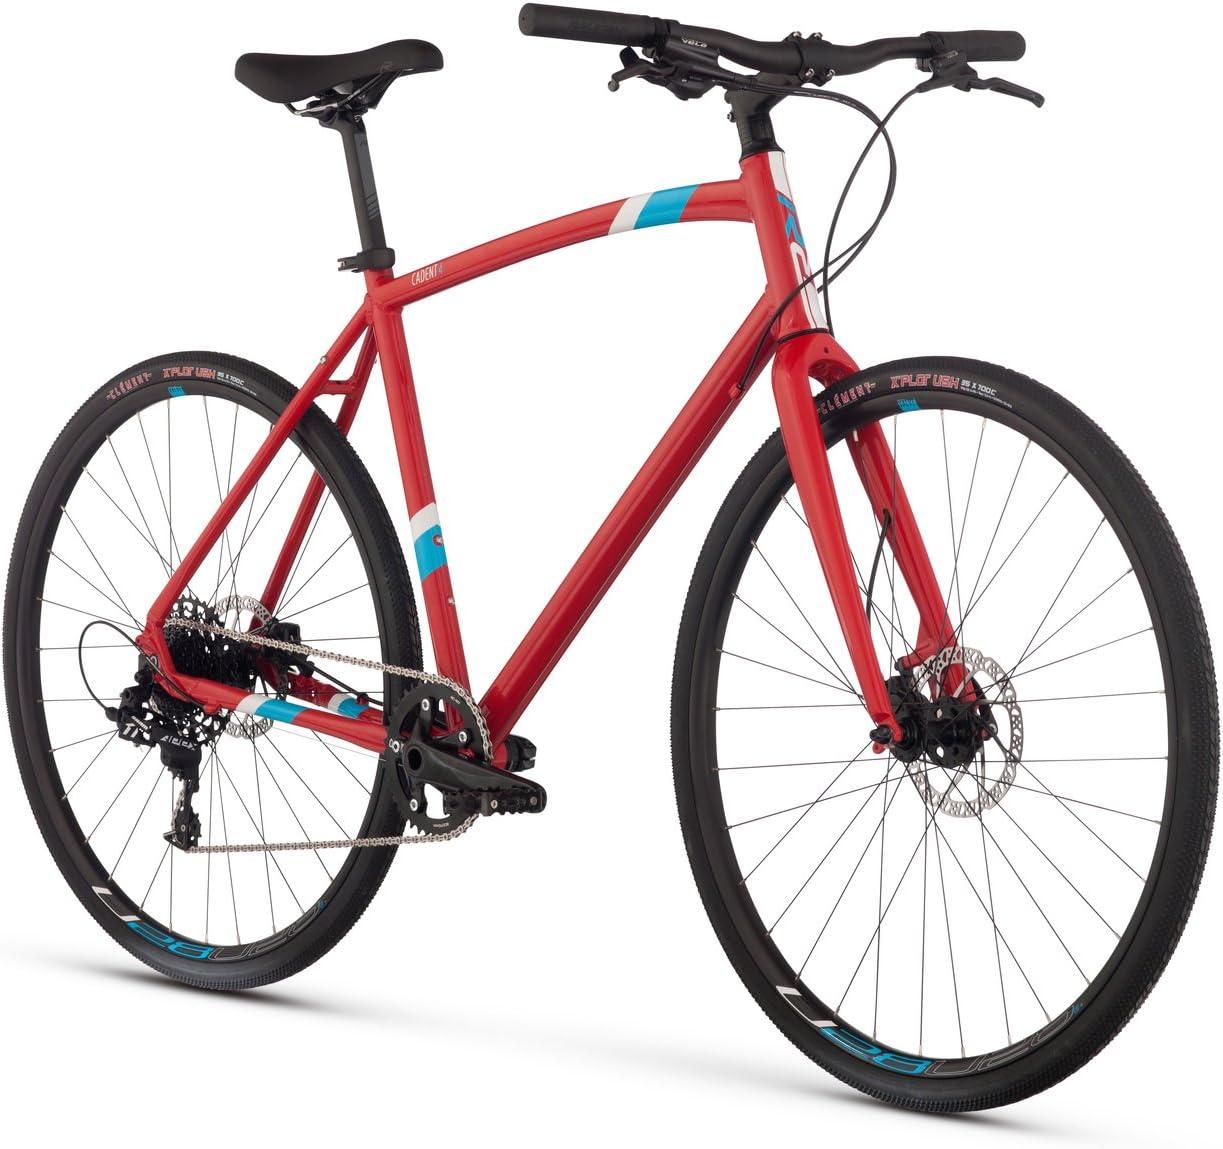 Raleigh Bikes Raleigh Cadent 4 Urban Fitness Bike, 15 ...